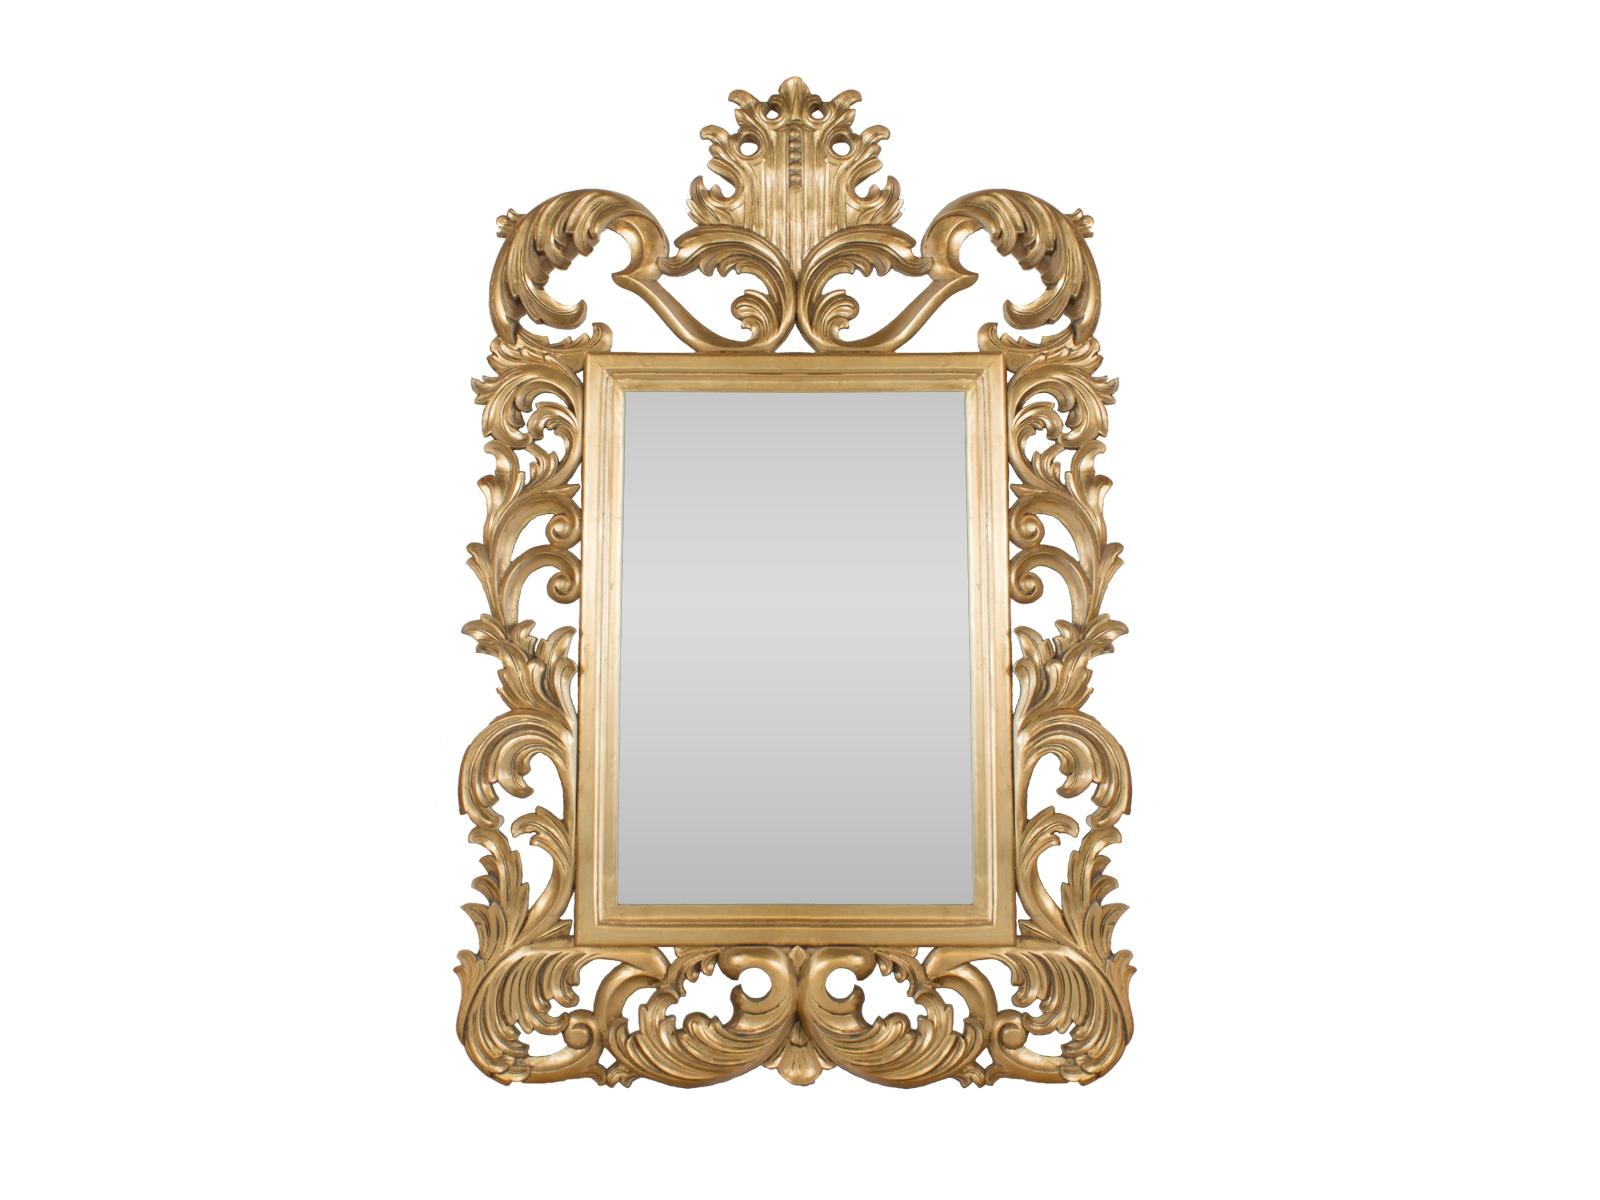 Gold Rococo Mirror – Hidden Mill Regarding Rococo Mirror Gold (View 8 of 20)